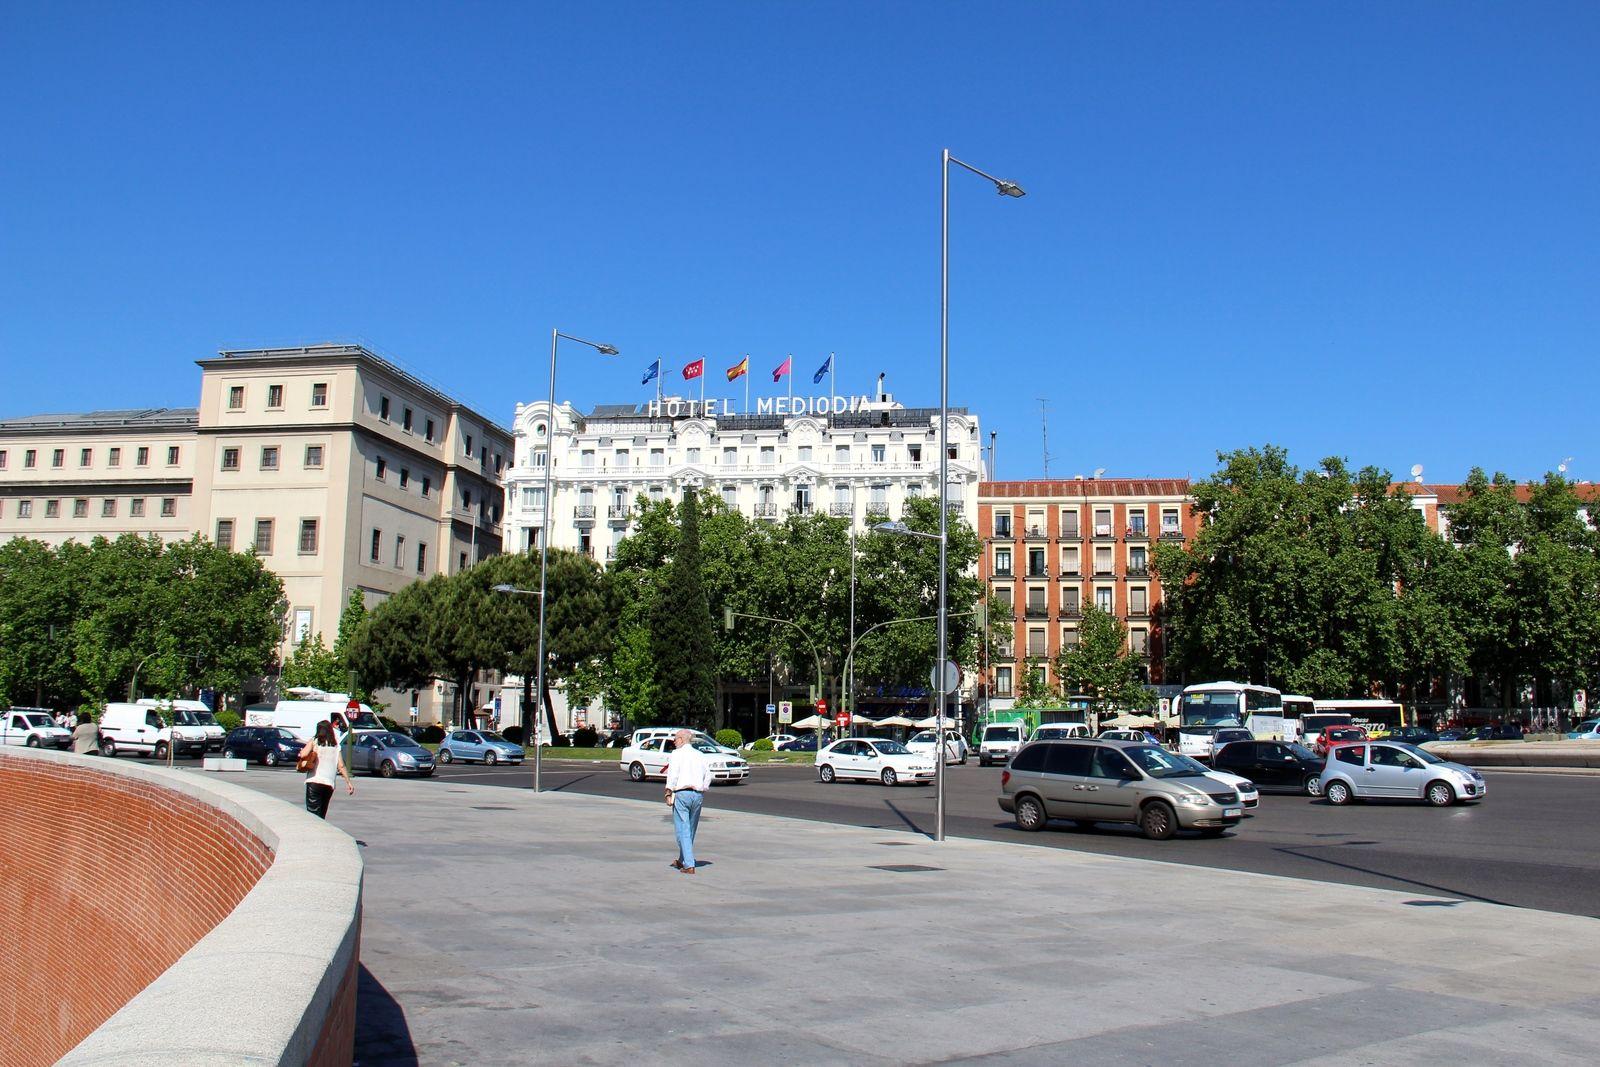 tennis-tourist-madrid-spain-hotel-mediodia-front-of-building-wide-shot-teri-church